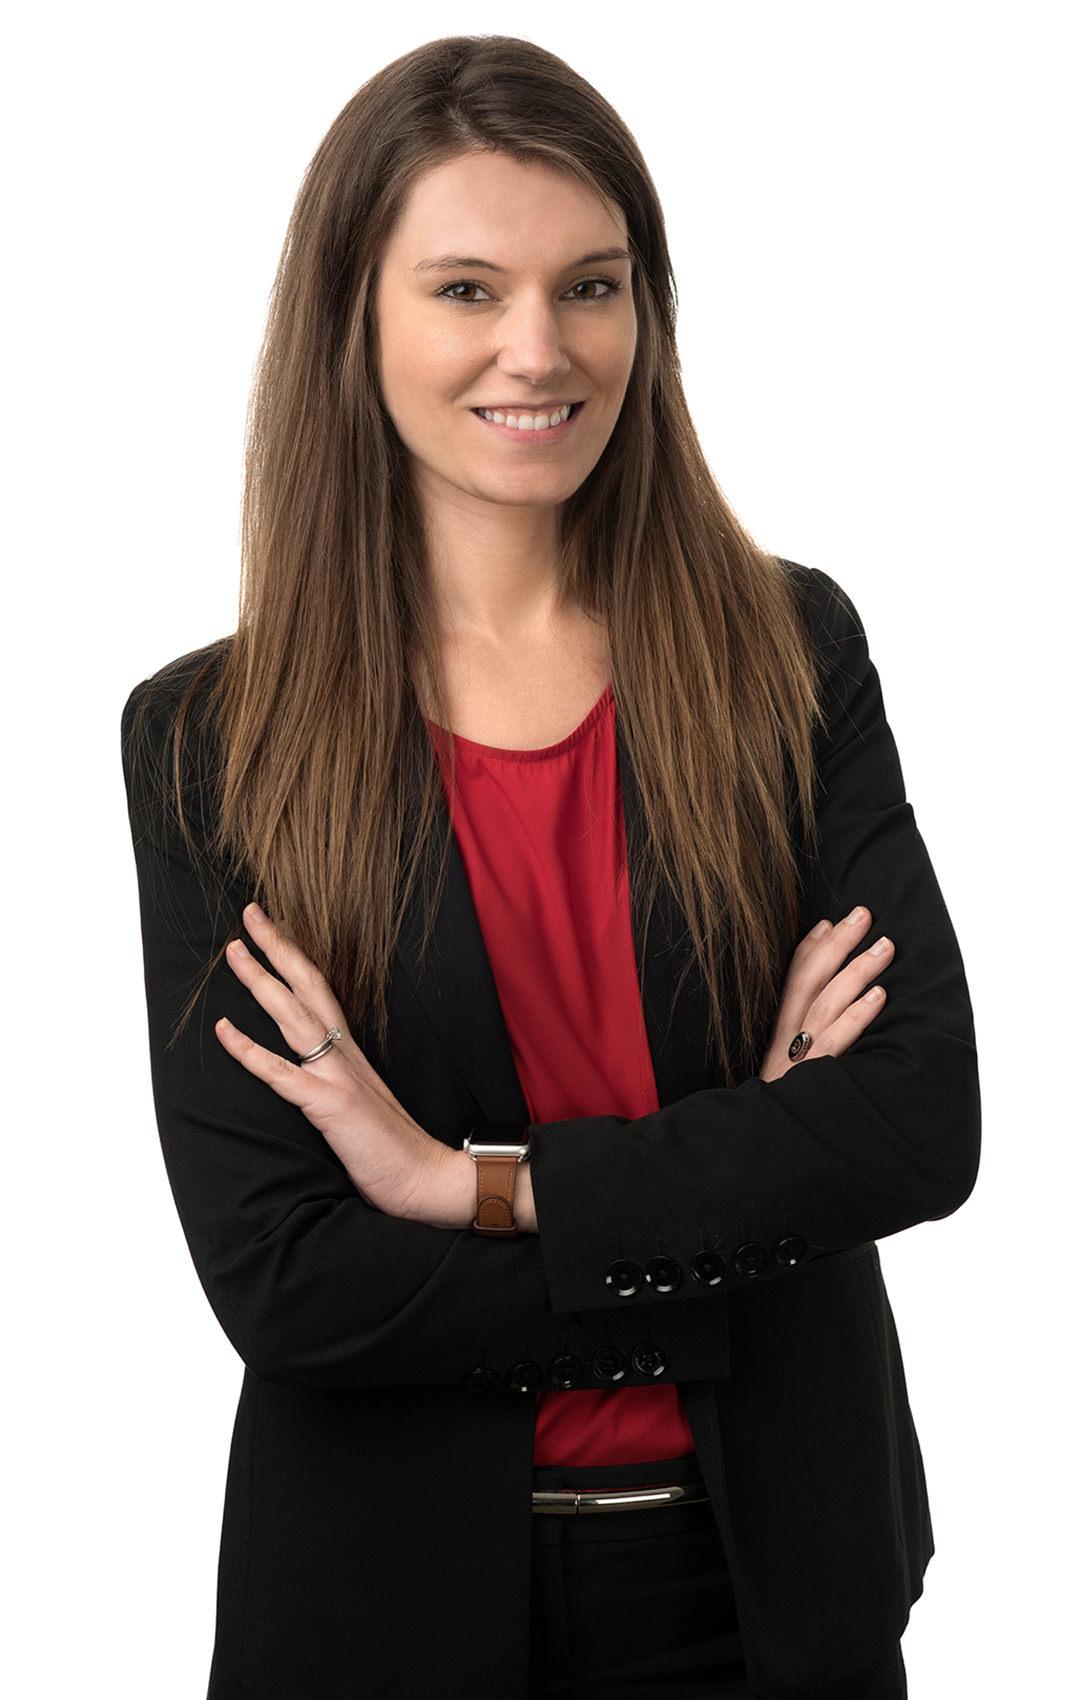 Lindsay S. Van Slambrook